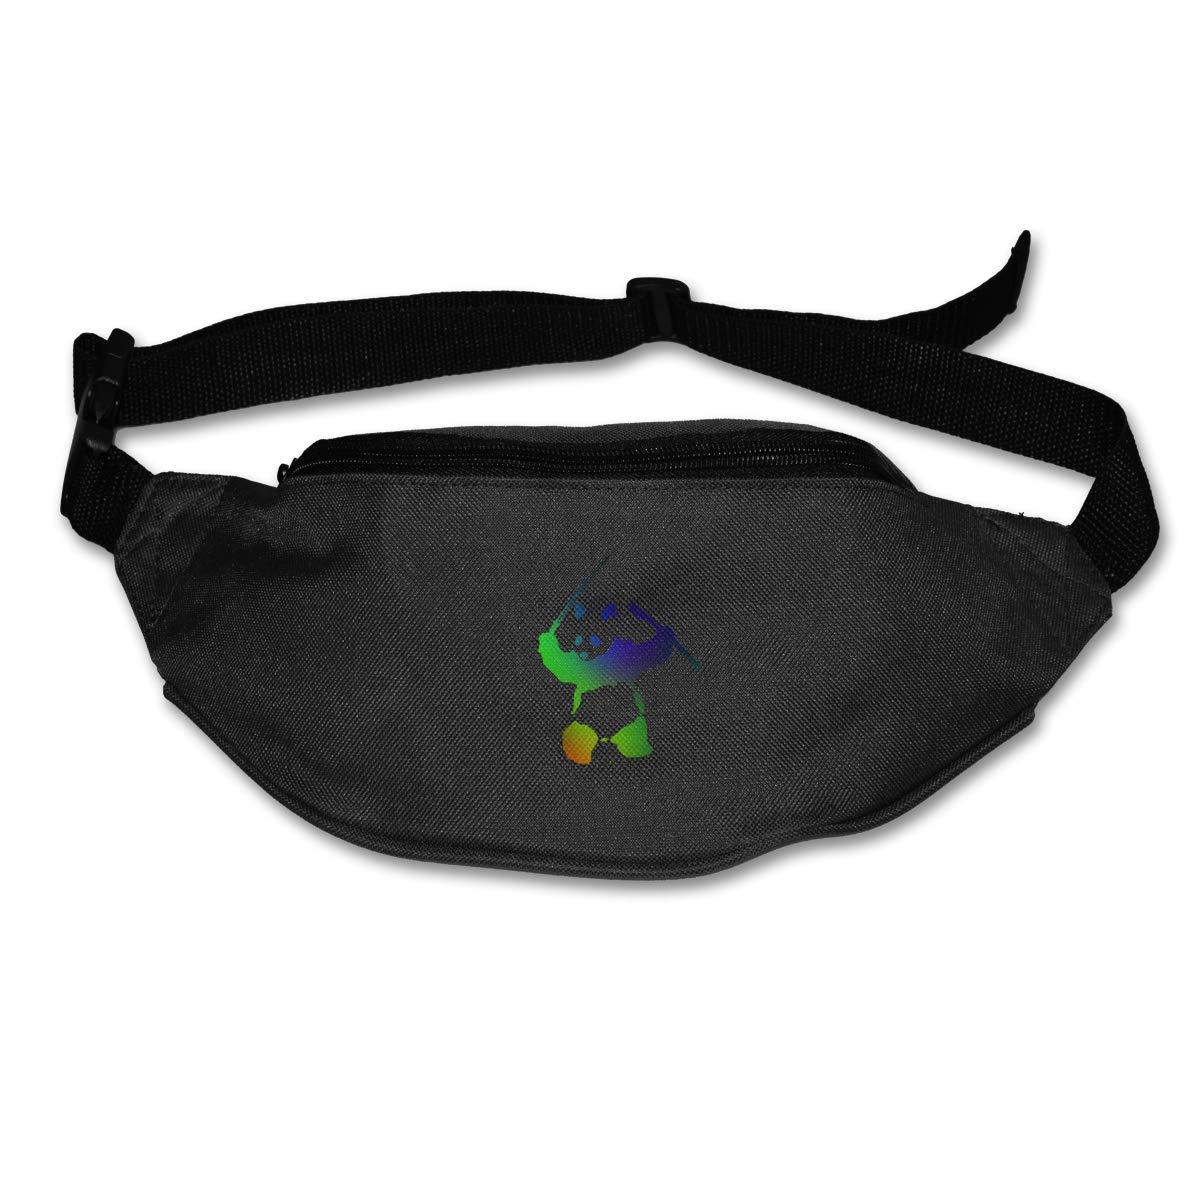 Colorful Panda Sport Waist Bag Fanny Pack Adjustable For Hike